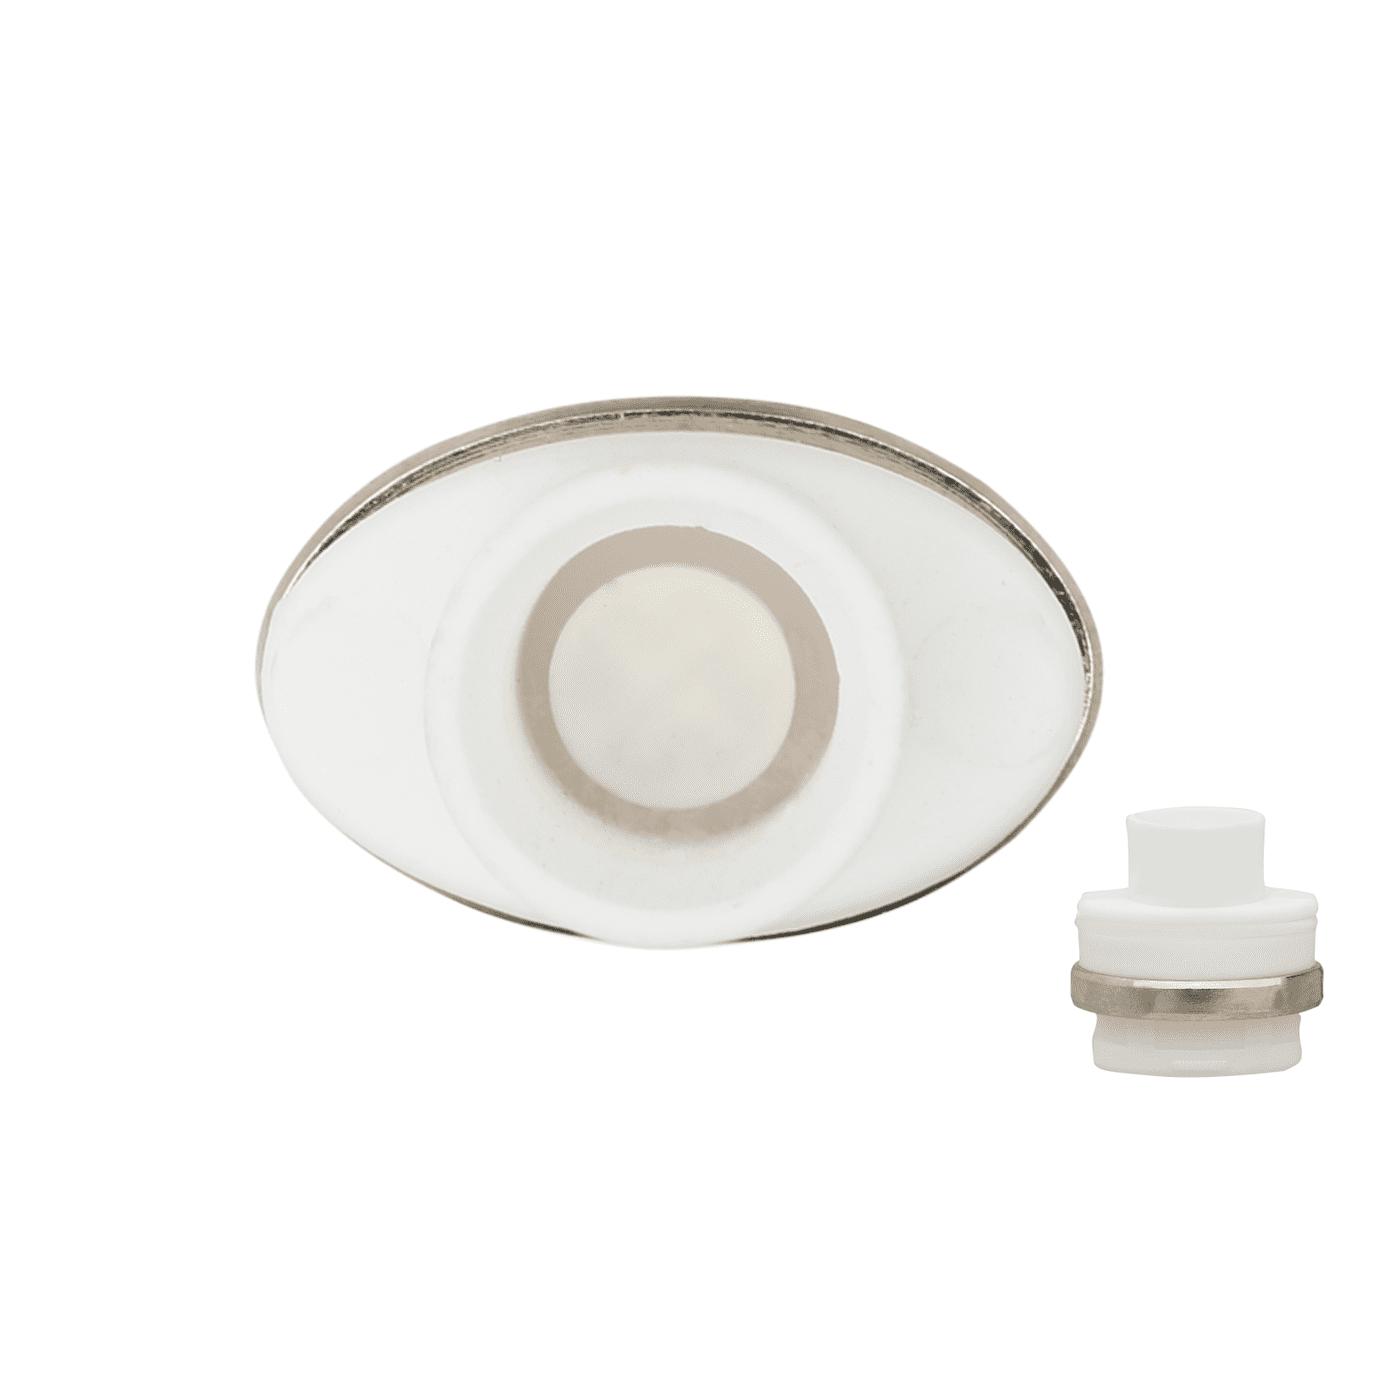 Buy Ceramic Plate Atomizer Vapor-weed bongs for sale